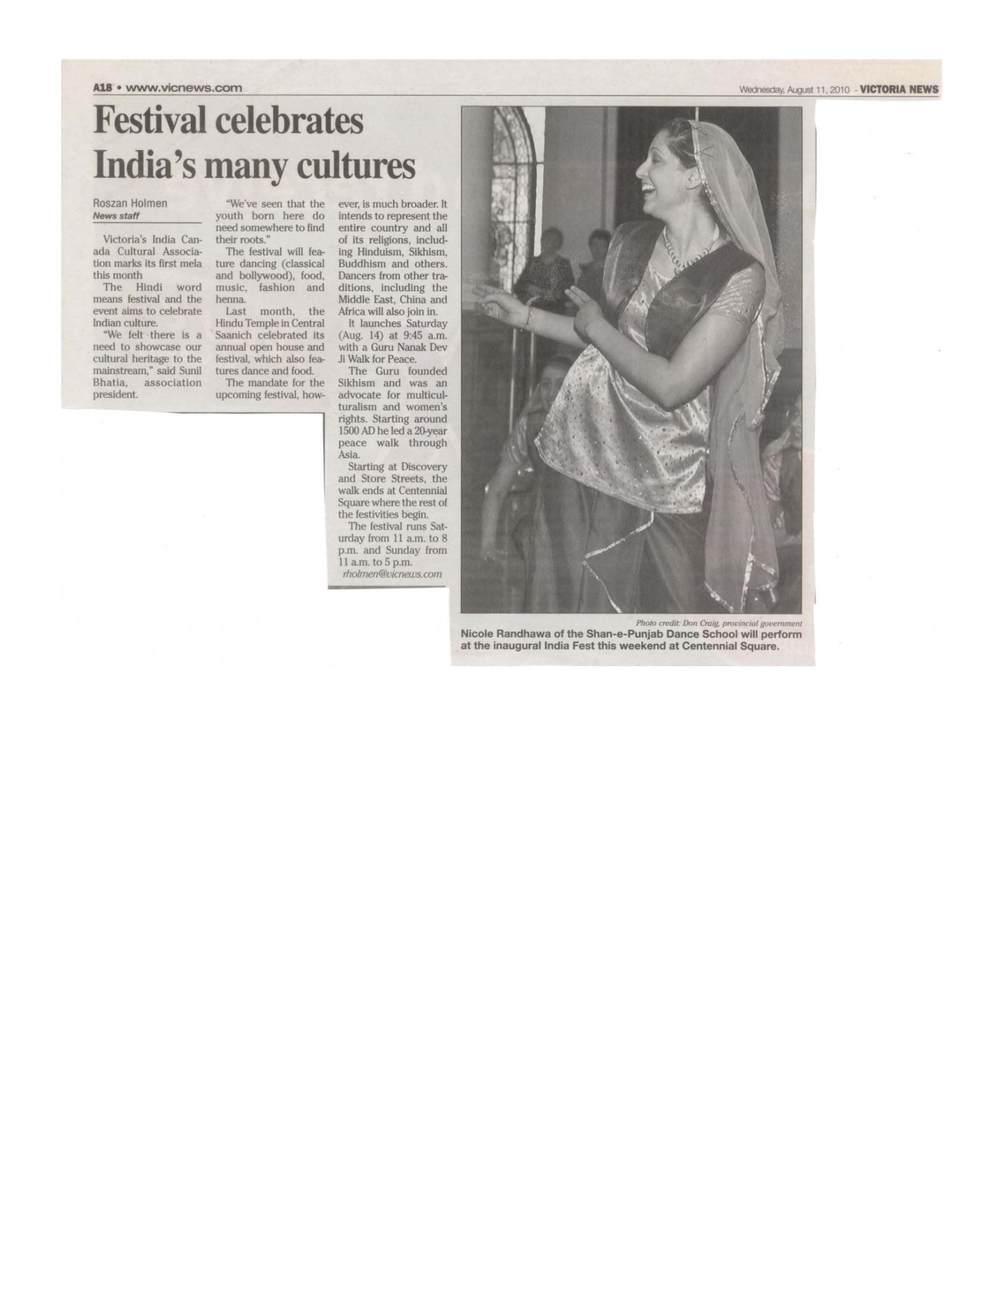 2010_Festival_celebrates_Indias_Many_cultures.jpg